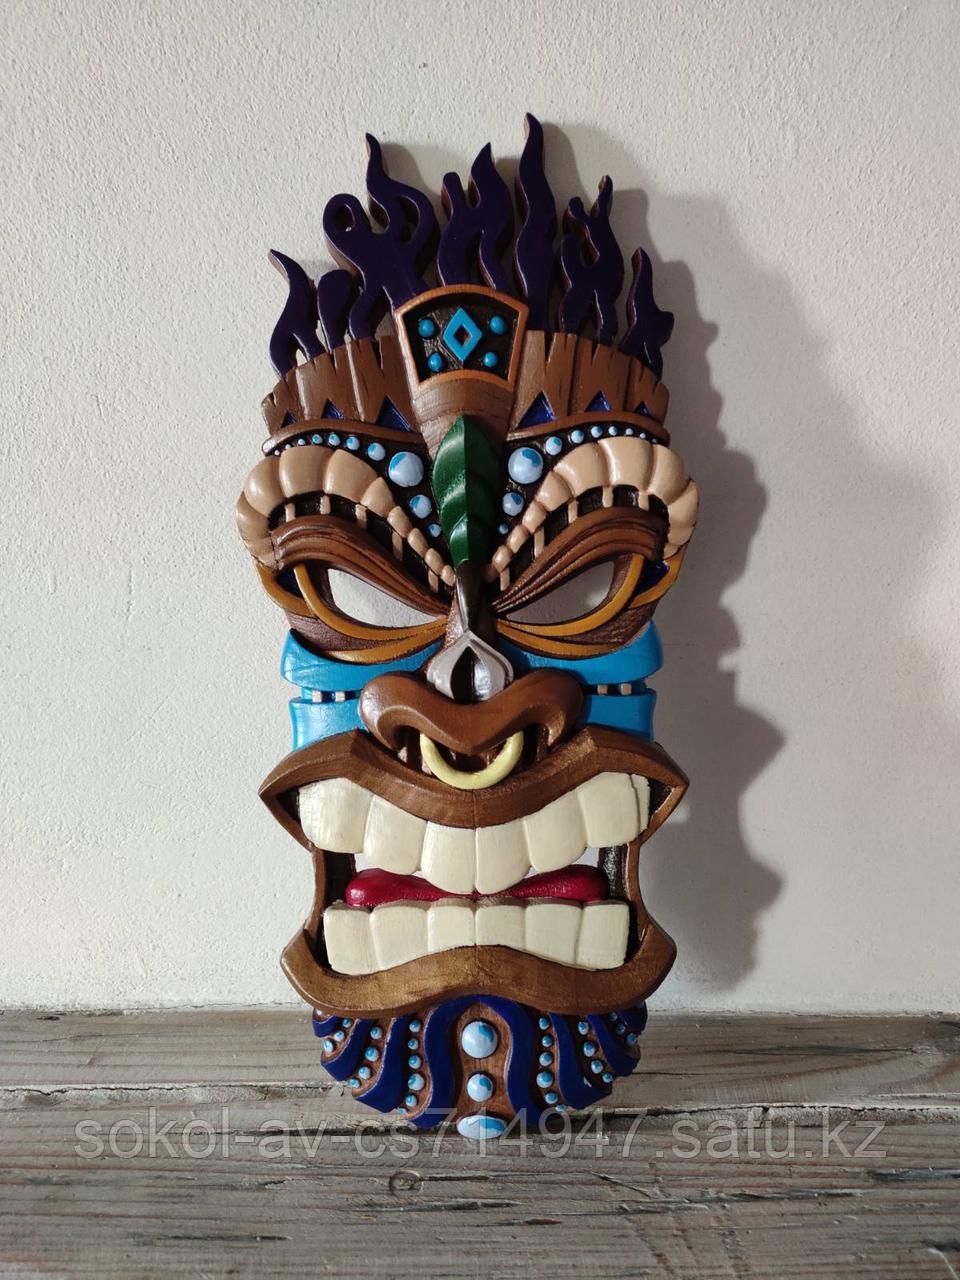 Панно маска настенная резная из дерева, декоративная, 65 х 29 х 3 см